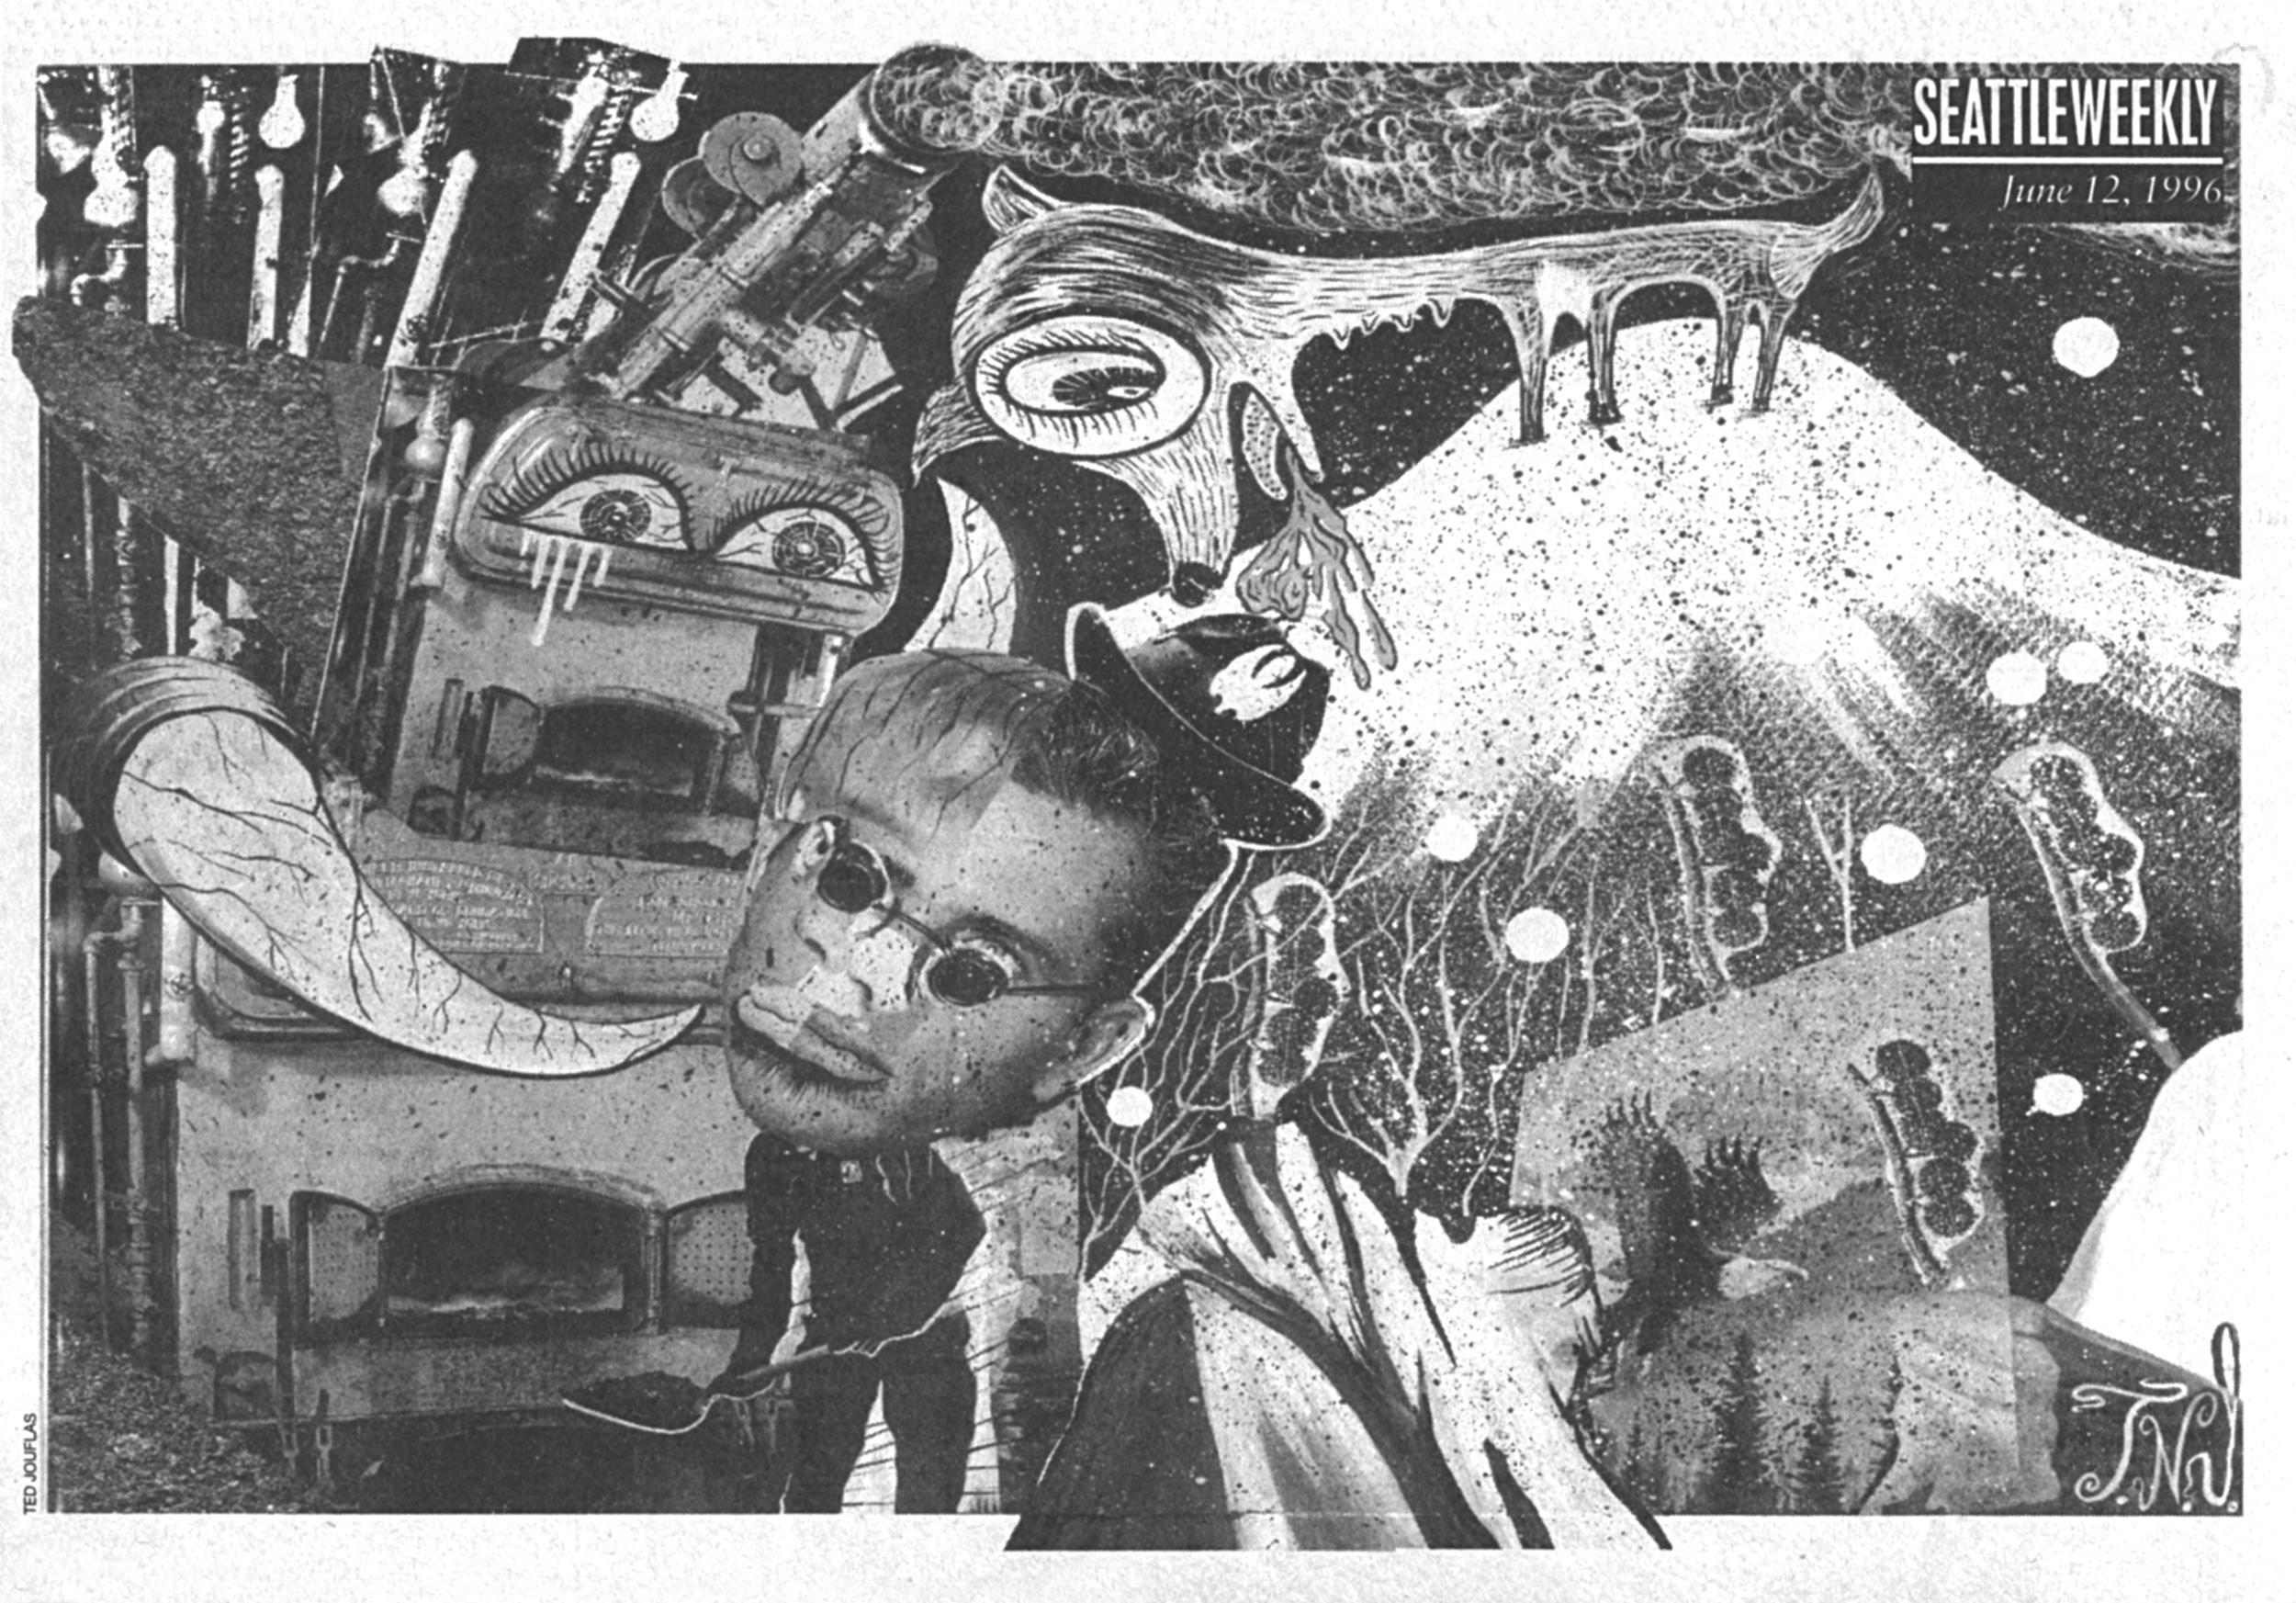 Black Elephant - Seattle Weekly 1996